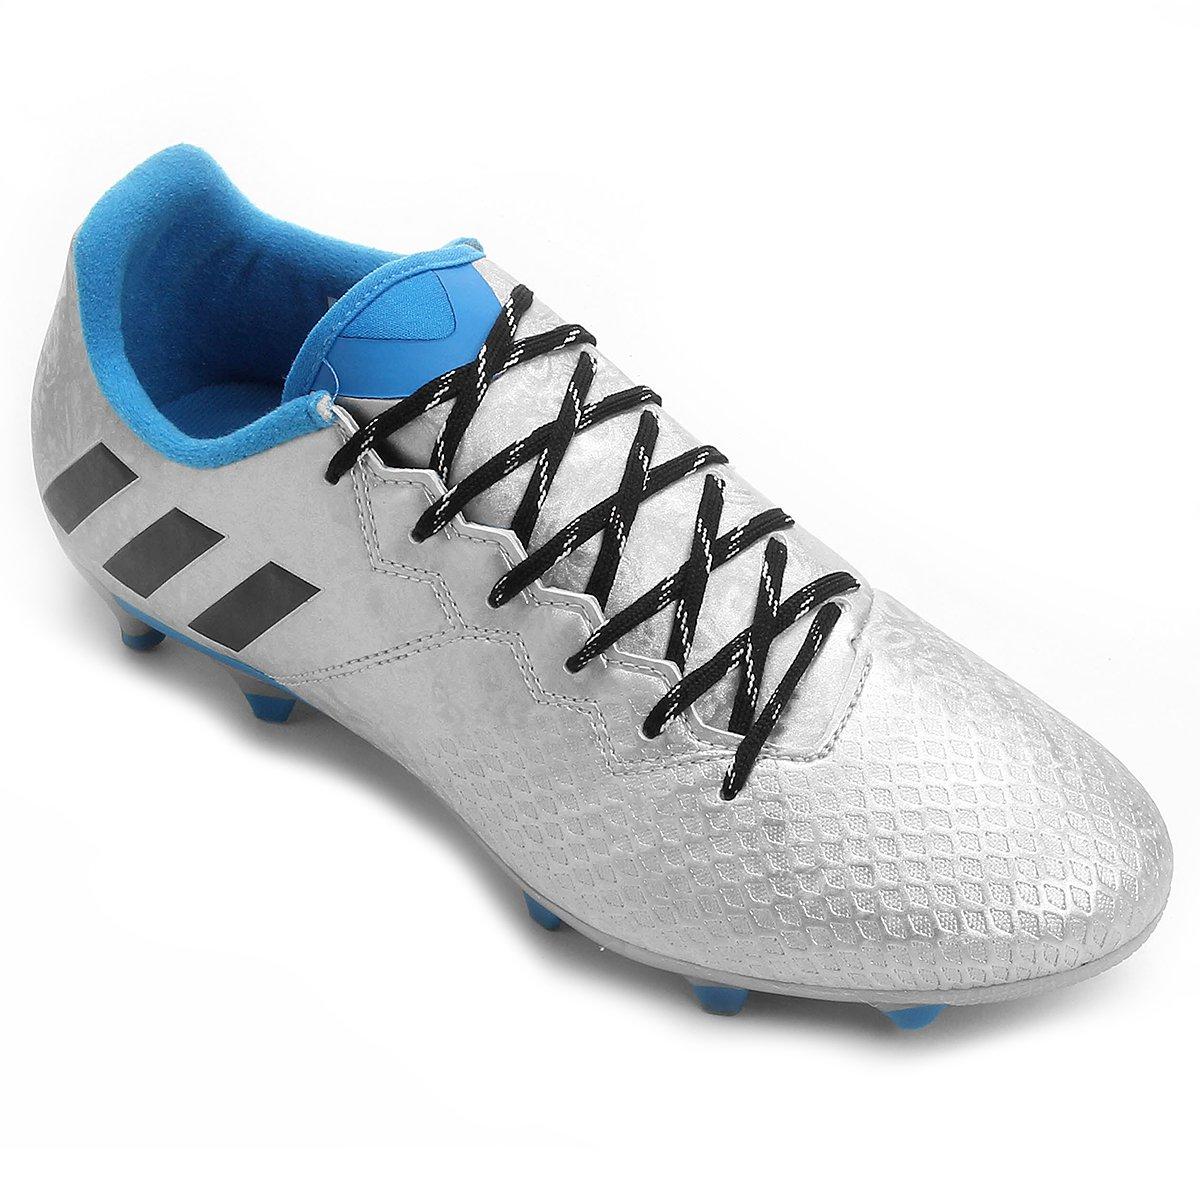 Chuteira Adidas Messi 16.3 FG Campo - Compre Agora  d53c2f6eee38d